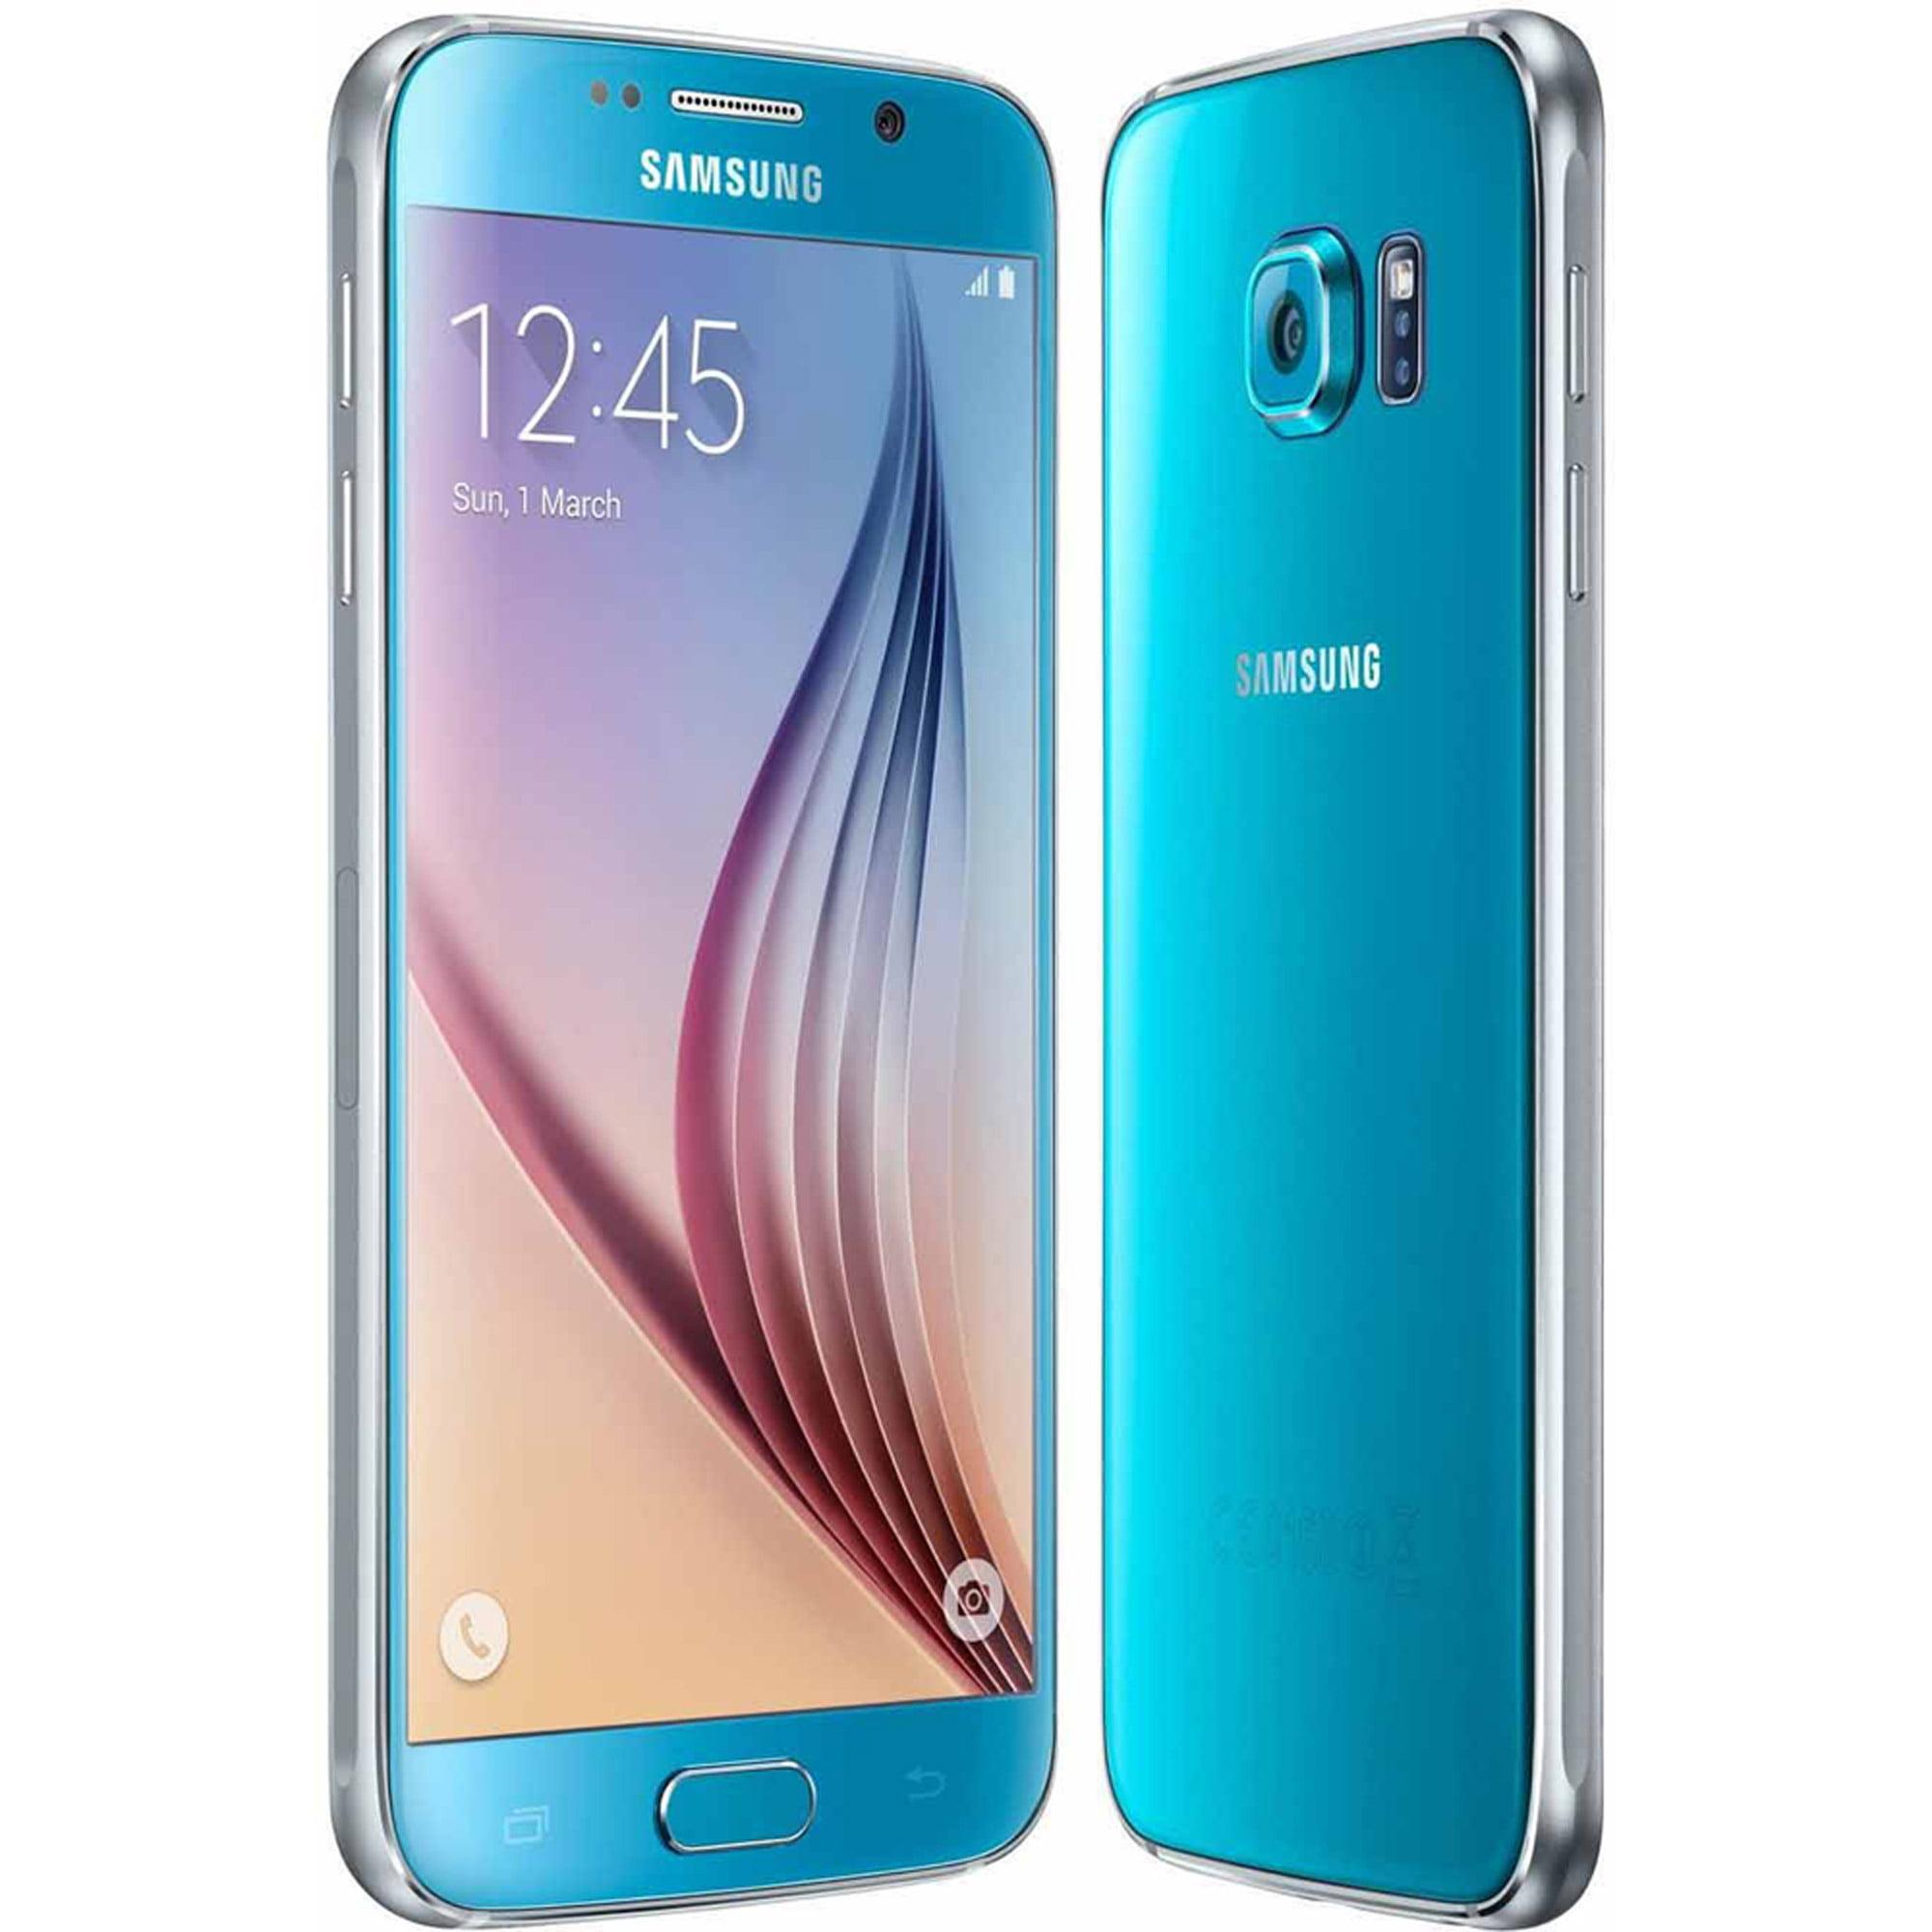 Samsung galaxy s6 - Samsung Galaxy S6 G920 32gb 4g Lte Octa Core Smartphone Gsm Network Unlocked Walmart Com